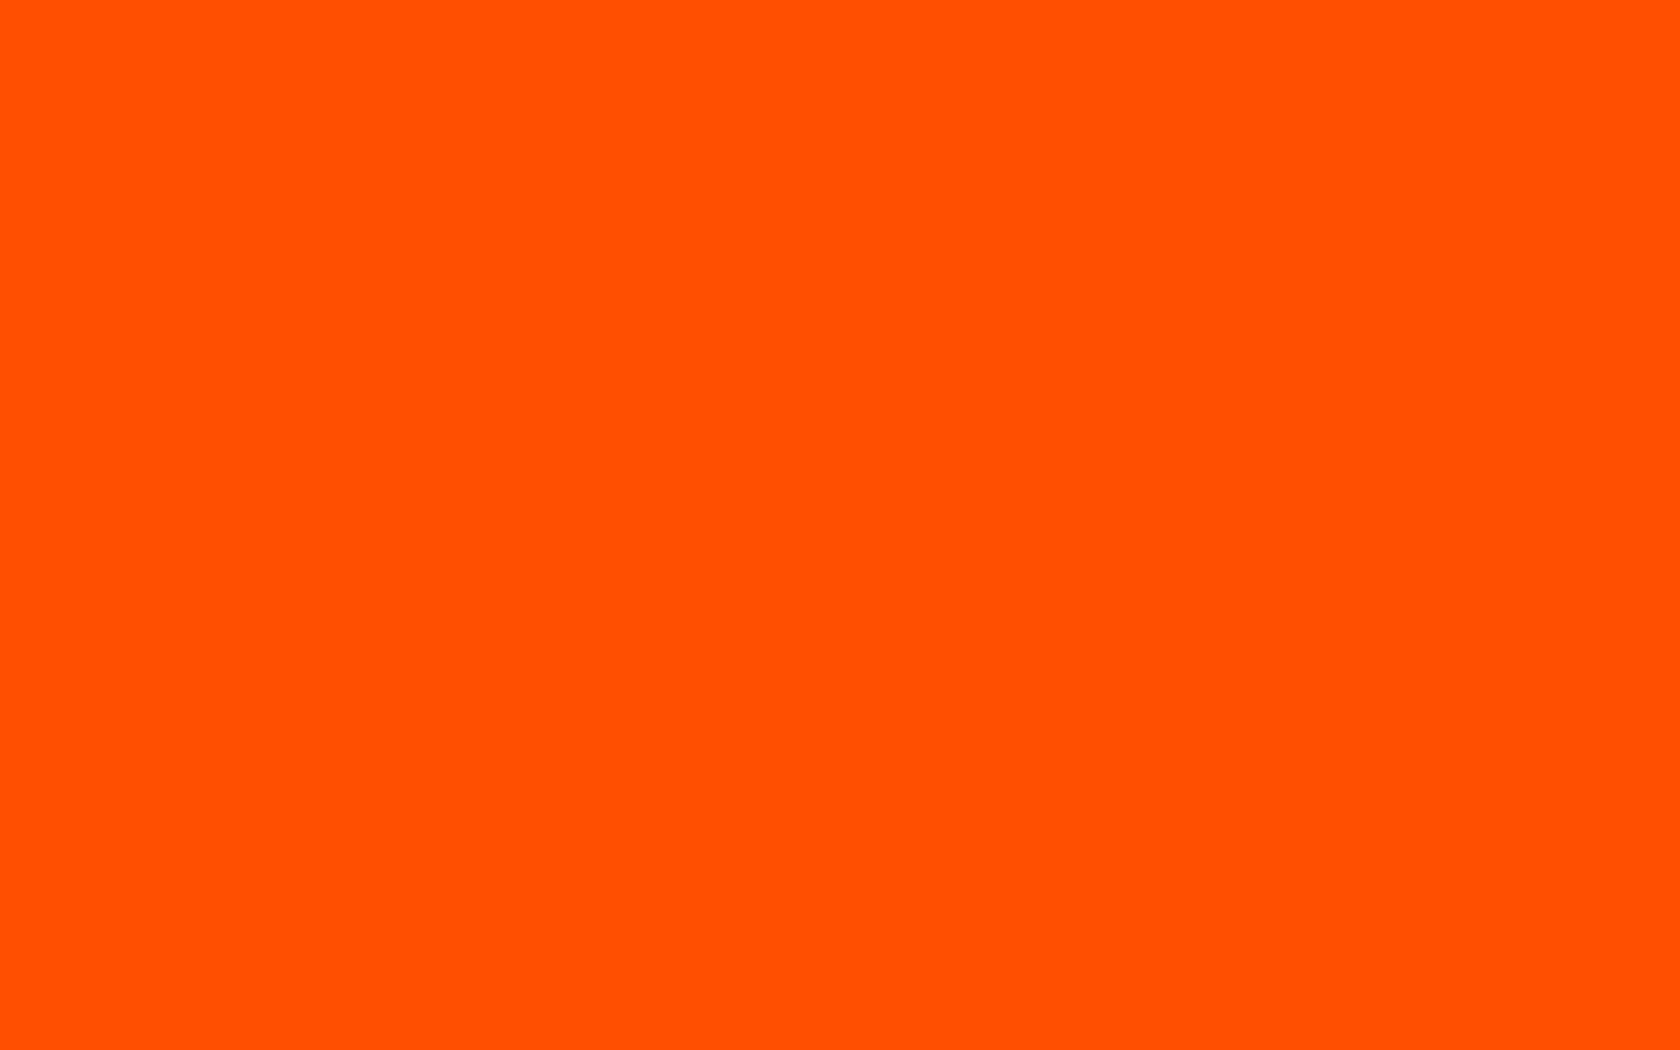 1680x1050 International Orange Aerospace Solid Color Background